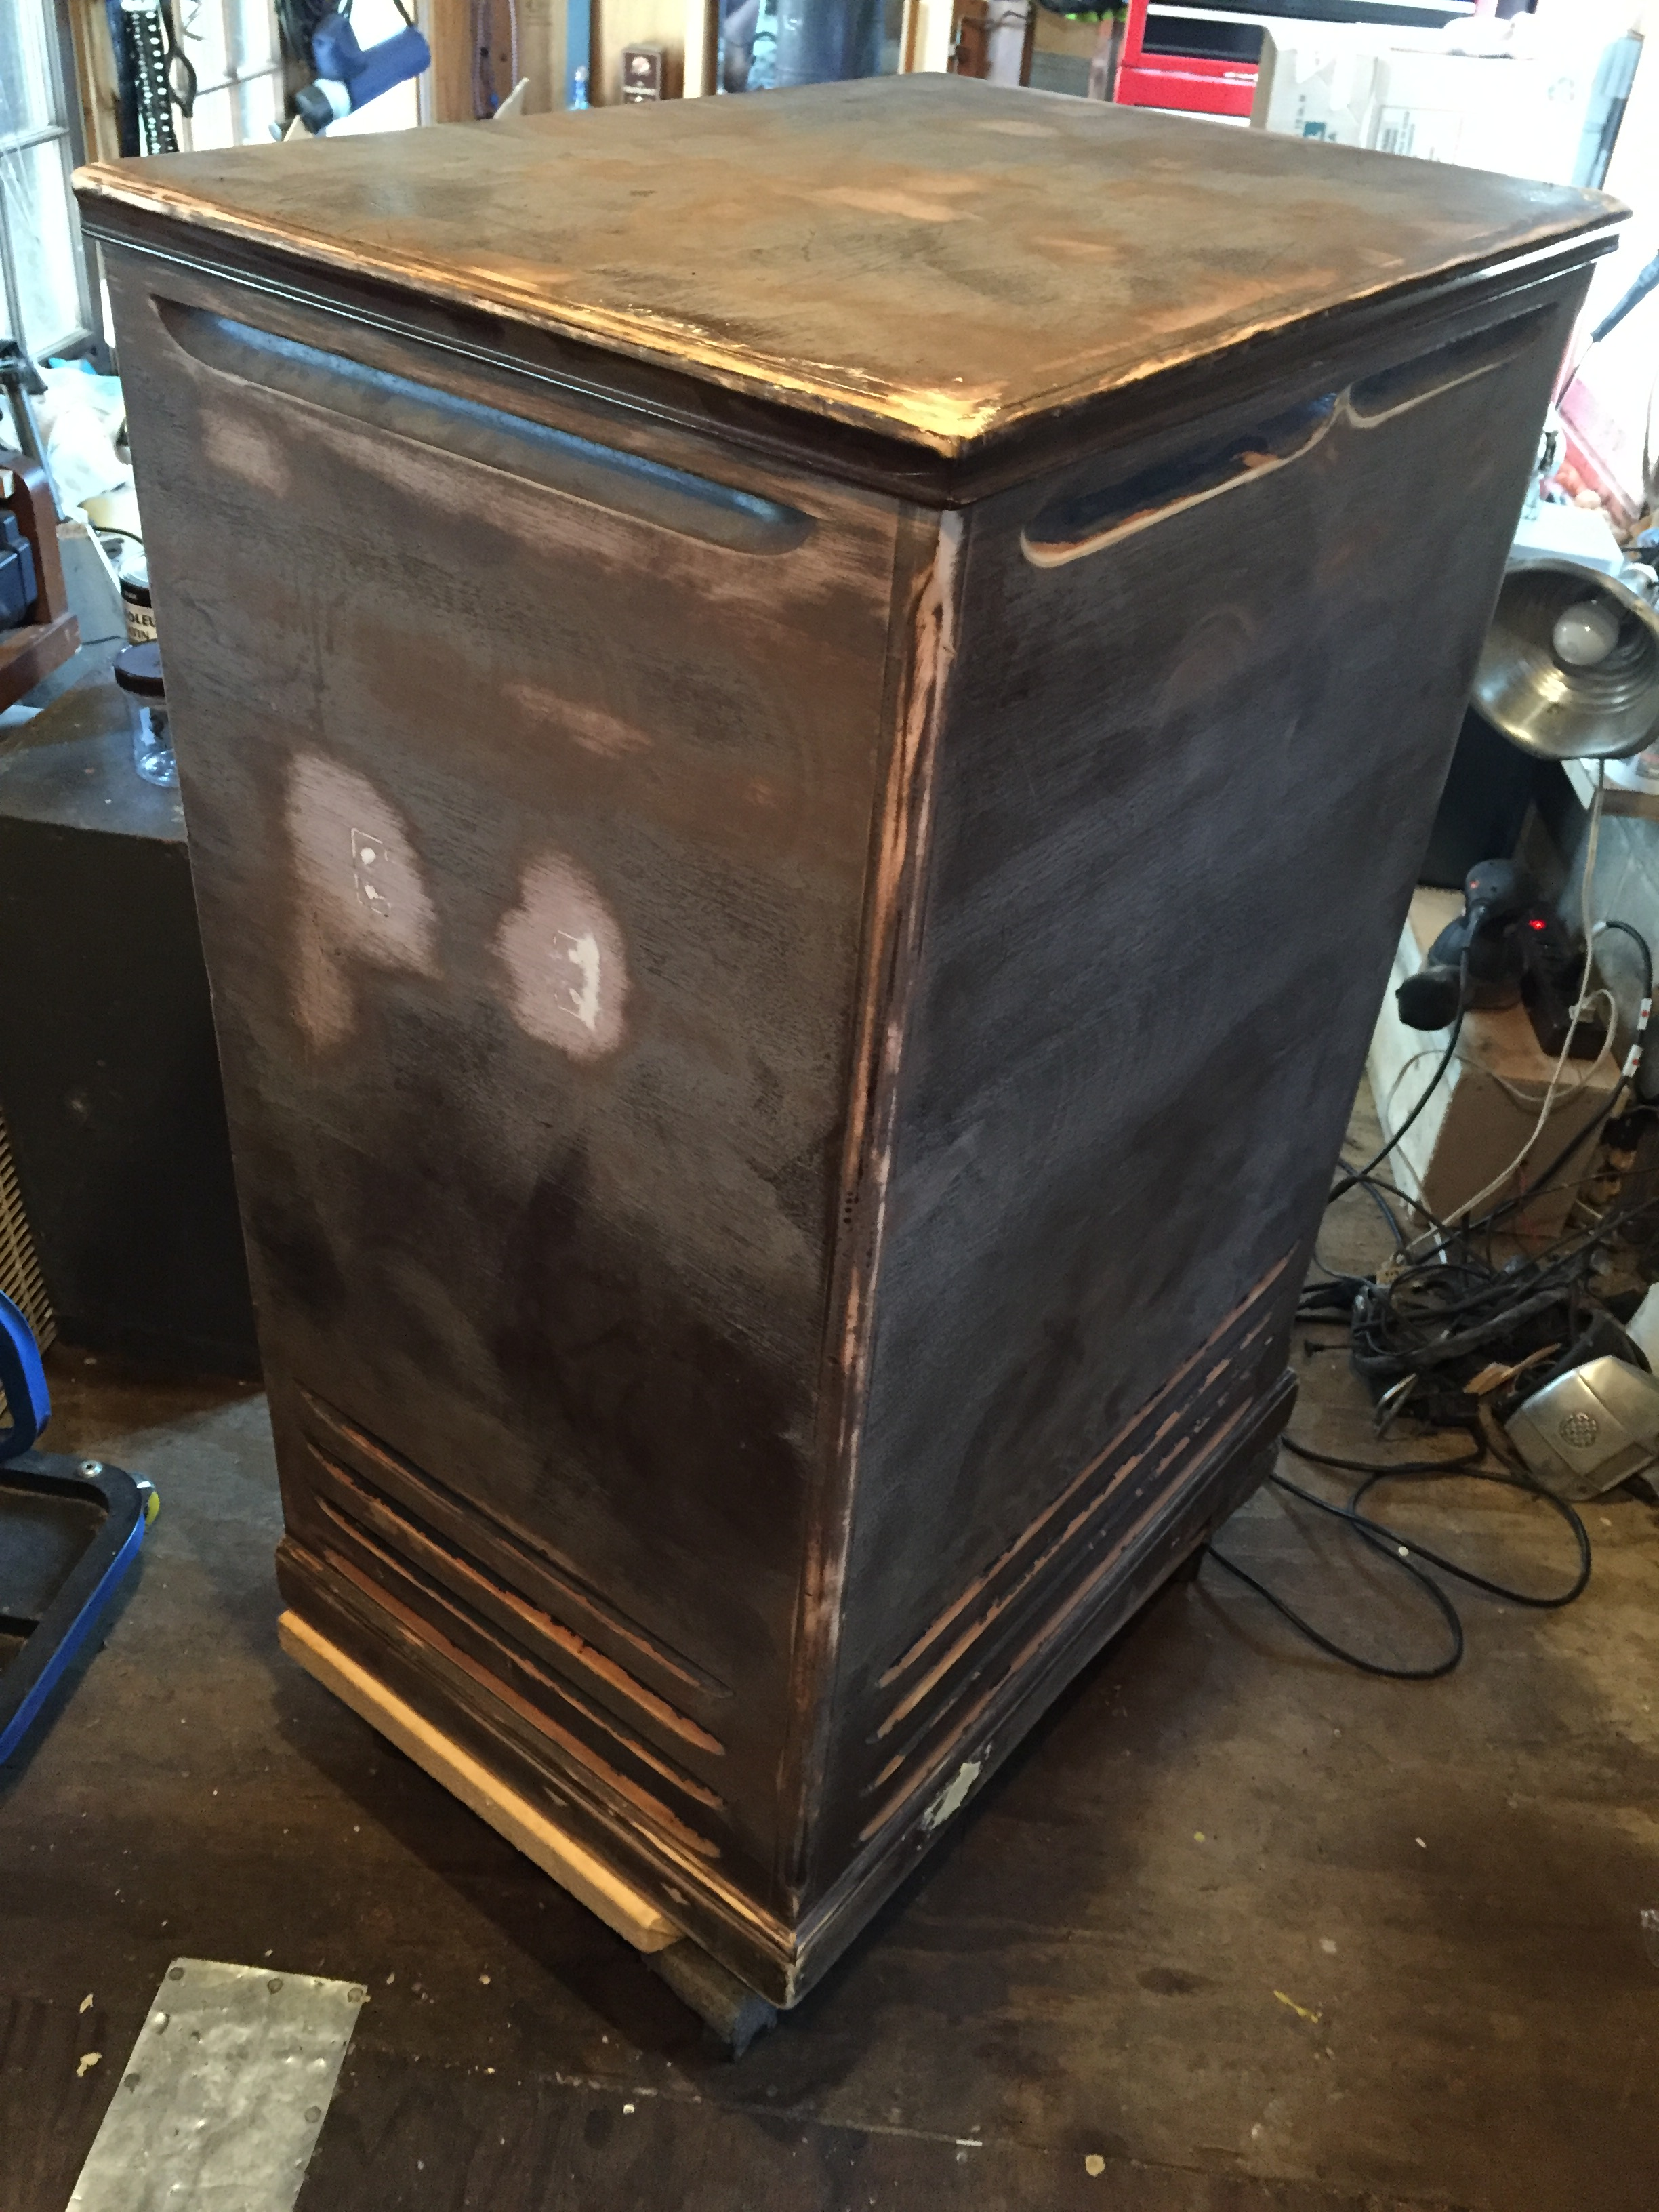 Handles removed, holes filled, cabinet sanded.